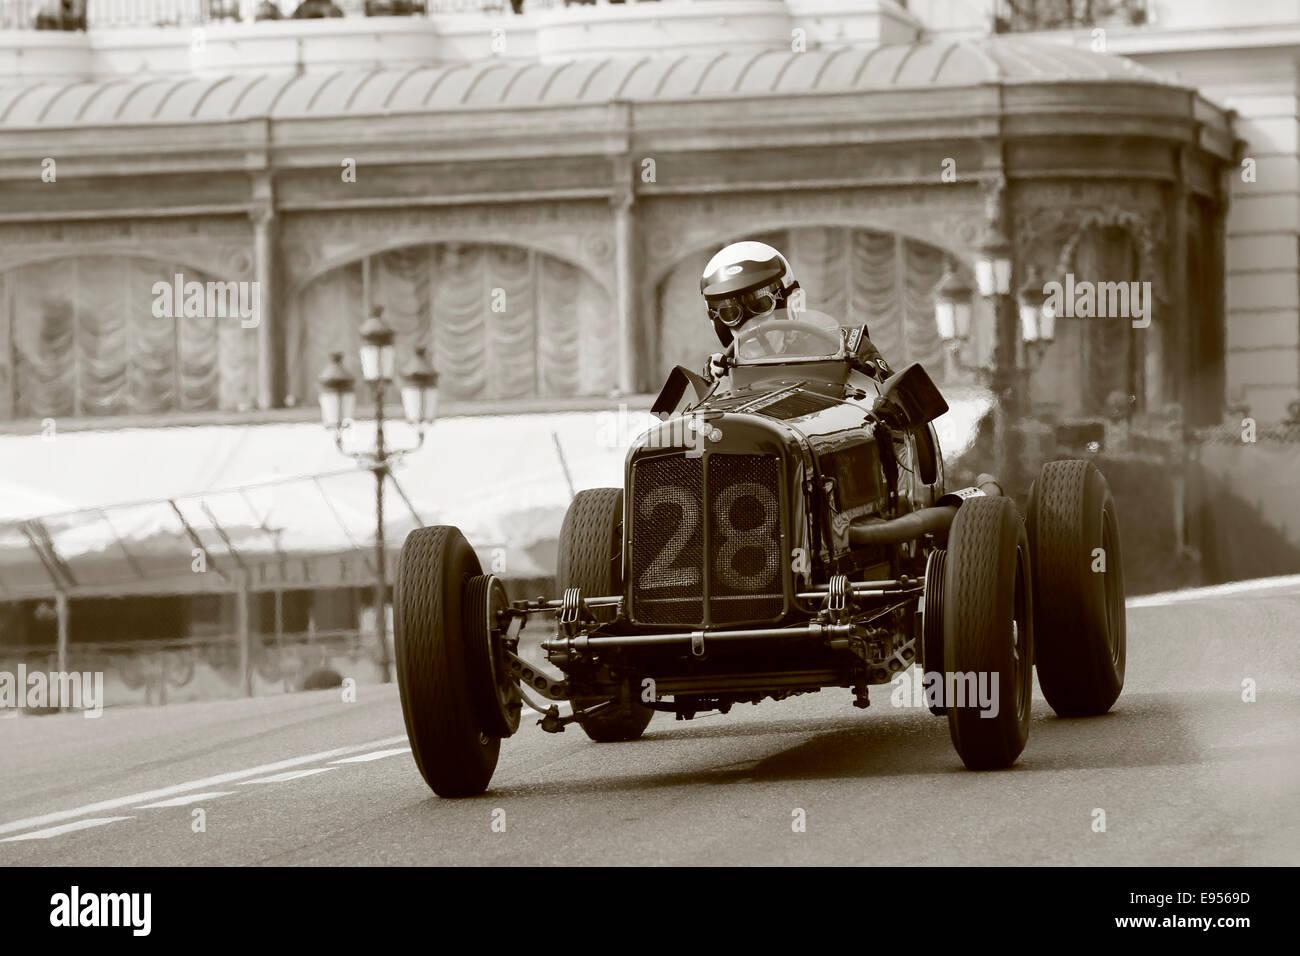 Historic racing car Era B, built in 1936, driver Paddins Dowling, 9th Grand Prix de Monaco Historique, Principality - Stock Image